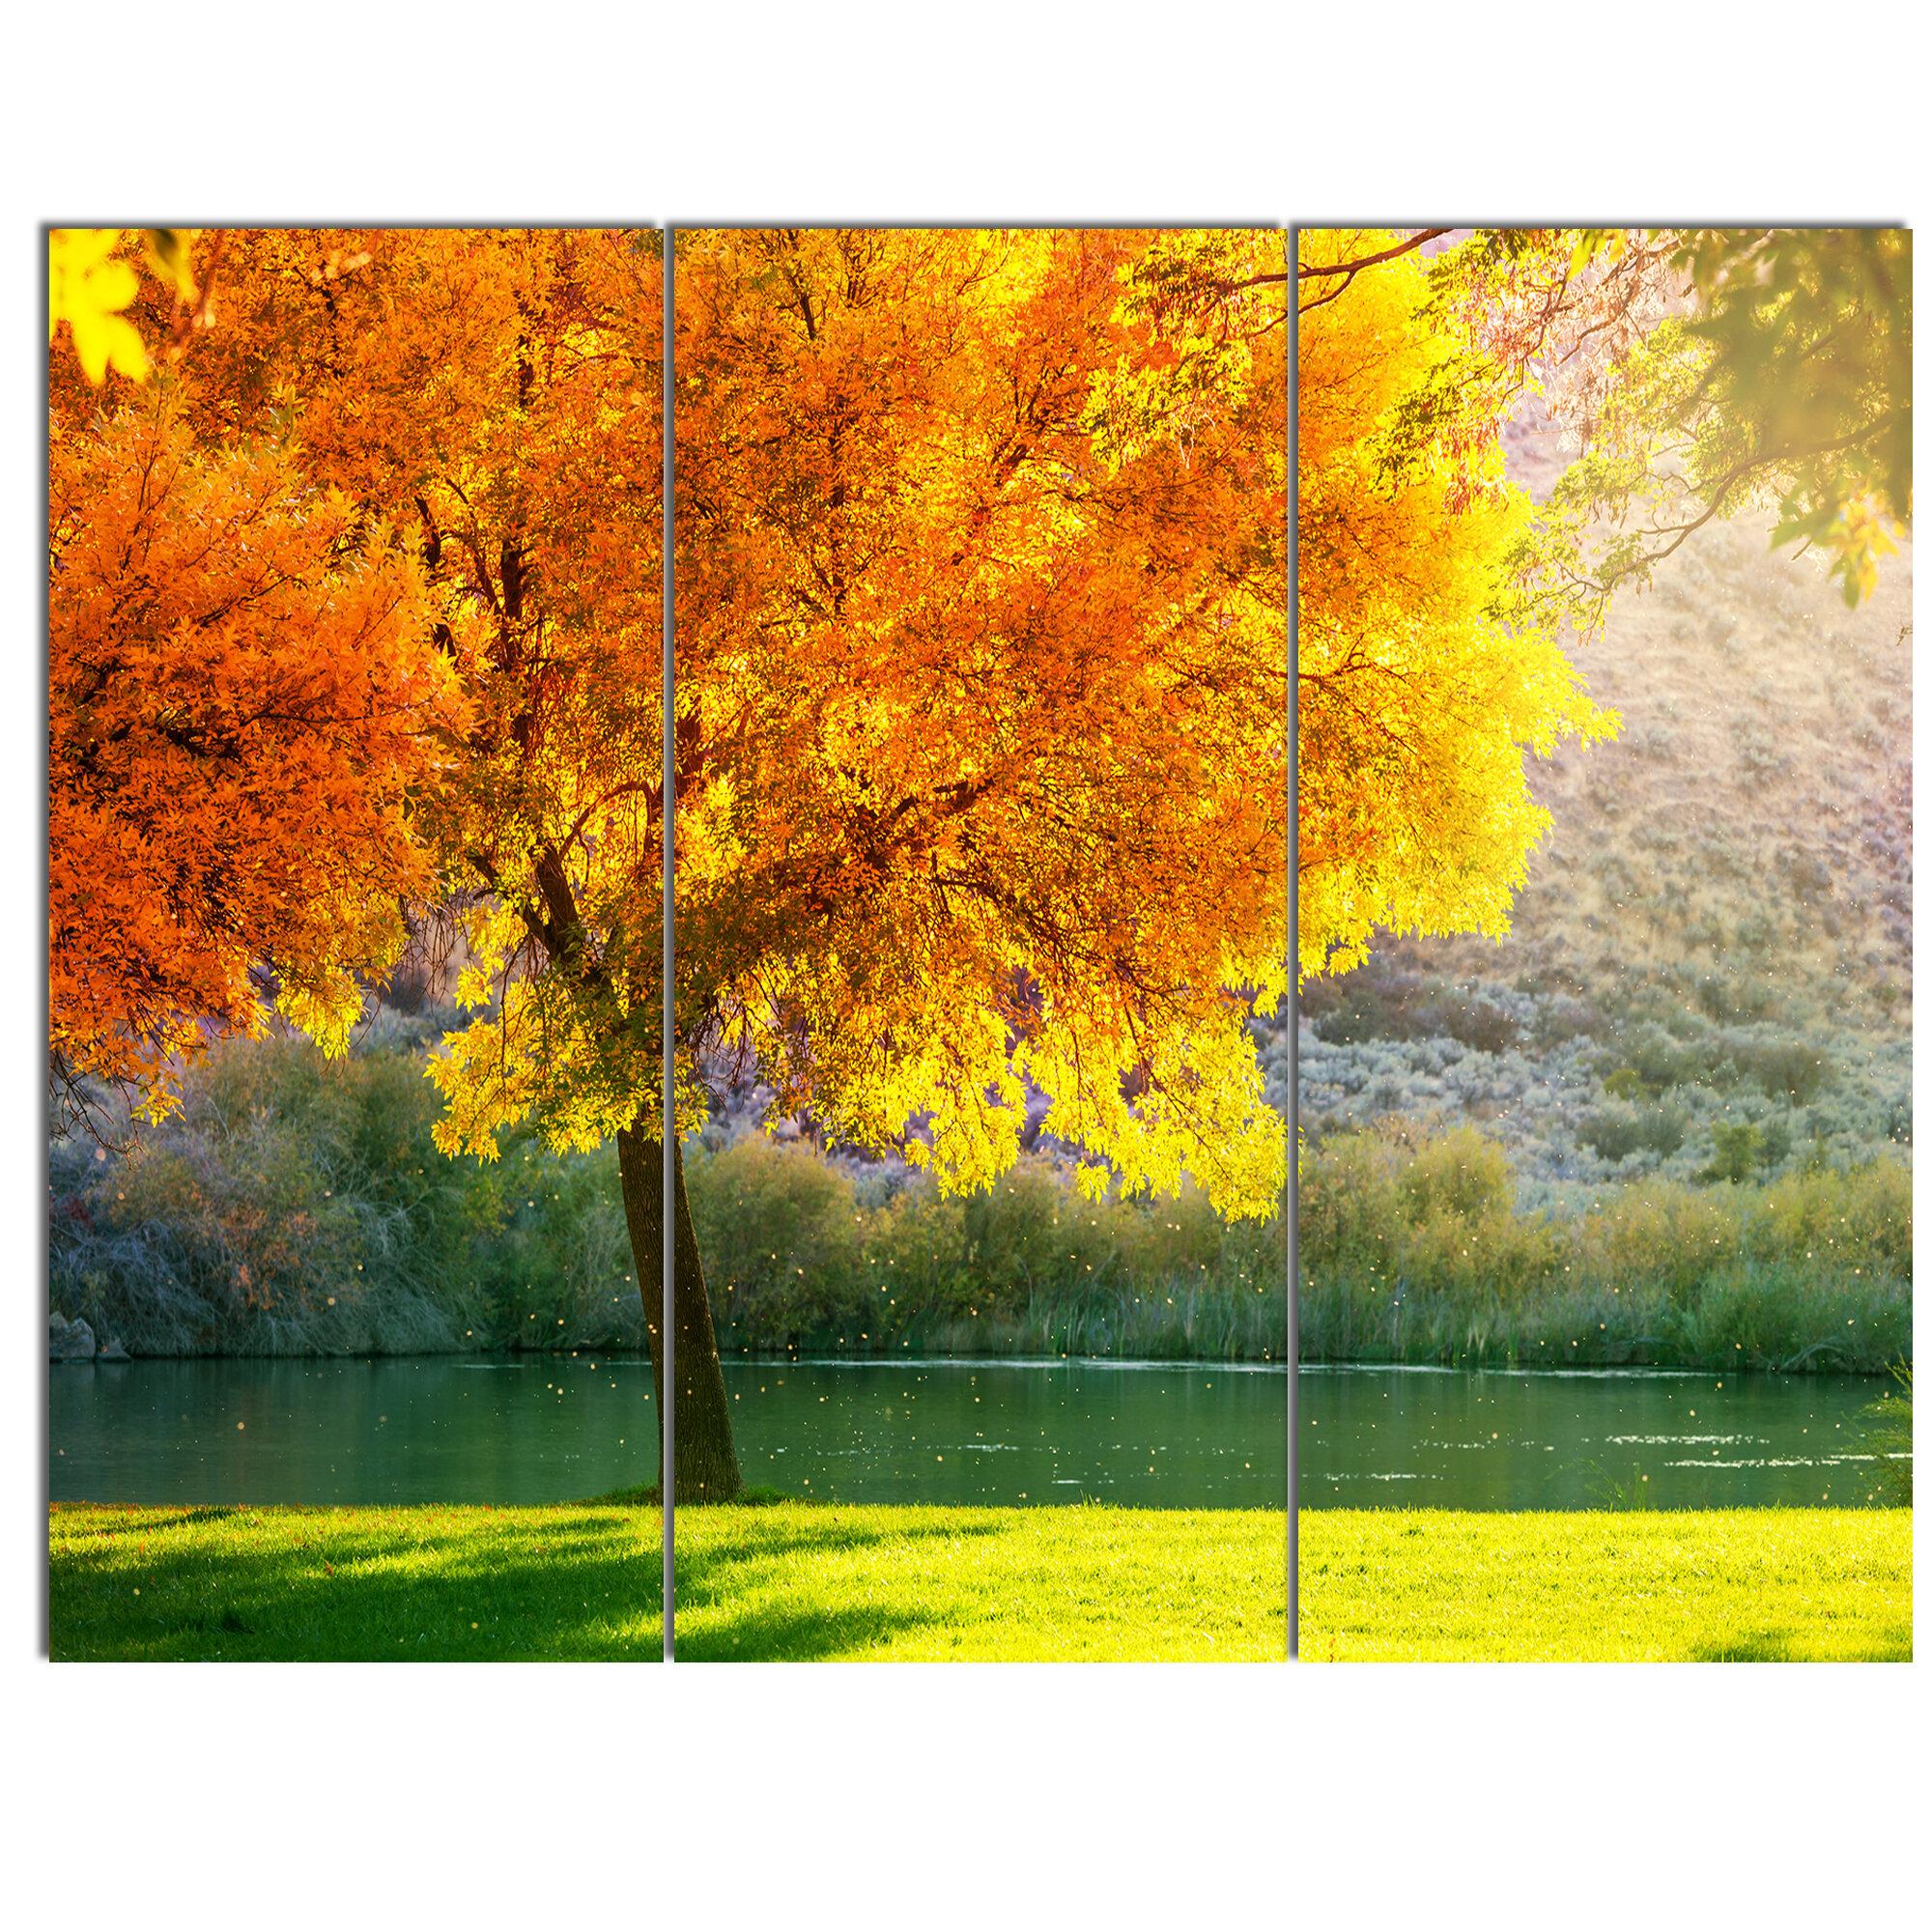 Designart Beautiful Autumn Season In Forest 3 Piece Photographic Print On Wrapped Canvas Set Wayfair